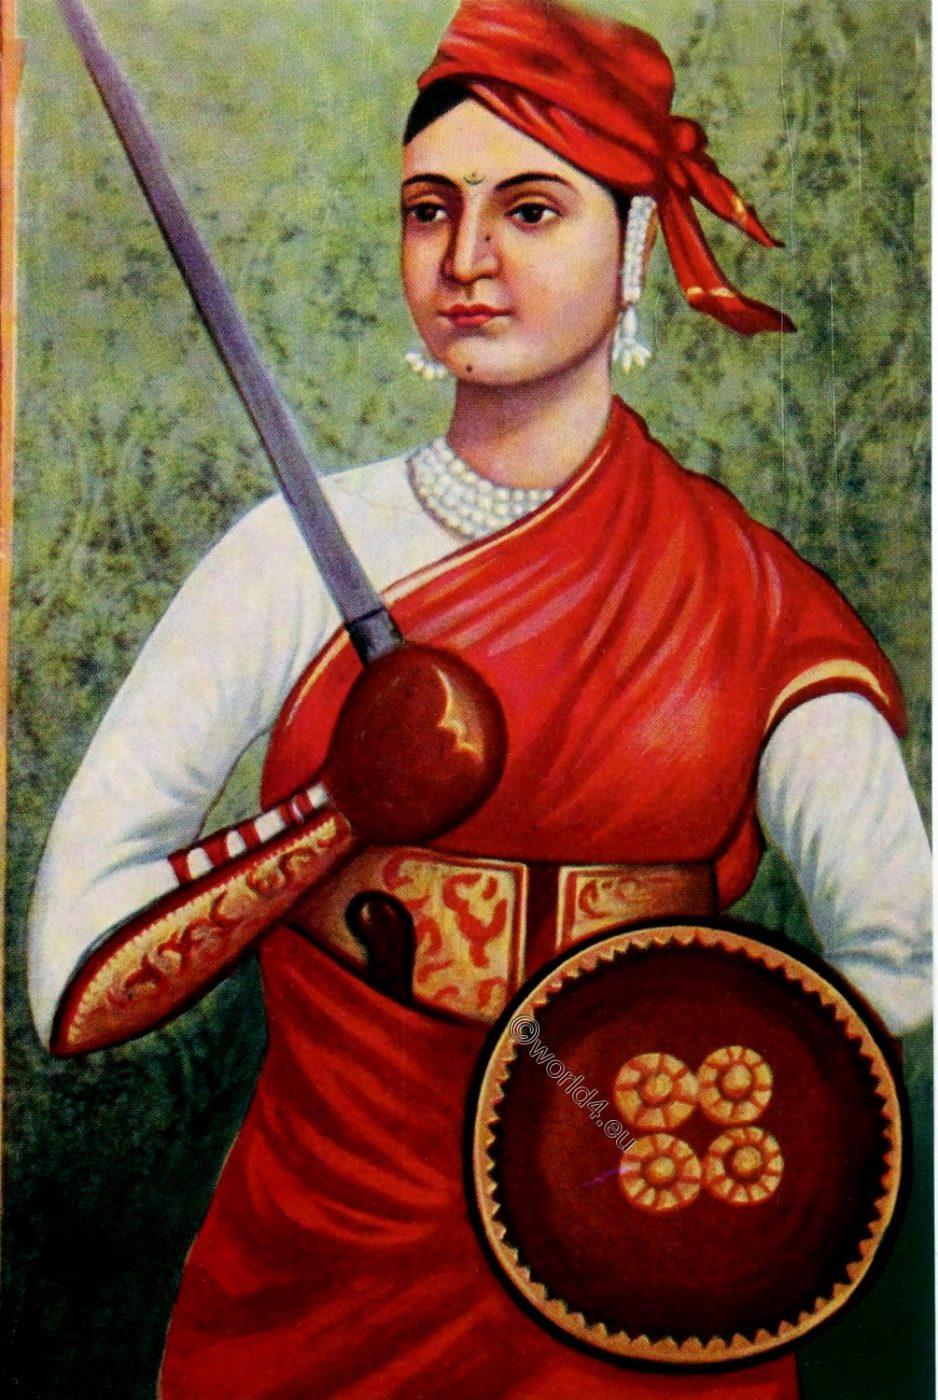 Lakshmibai, Rani, Jhansi, India, uprising